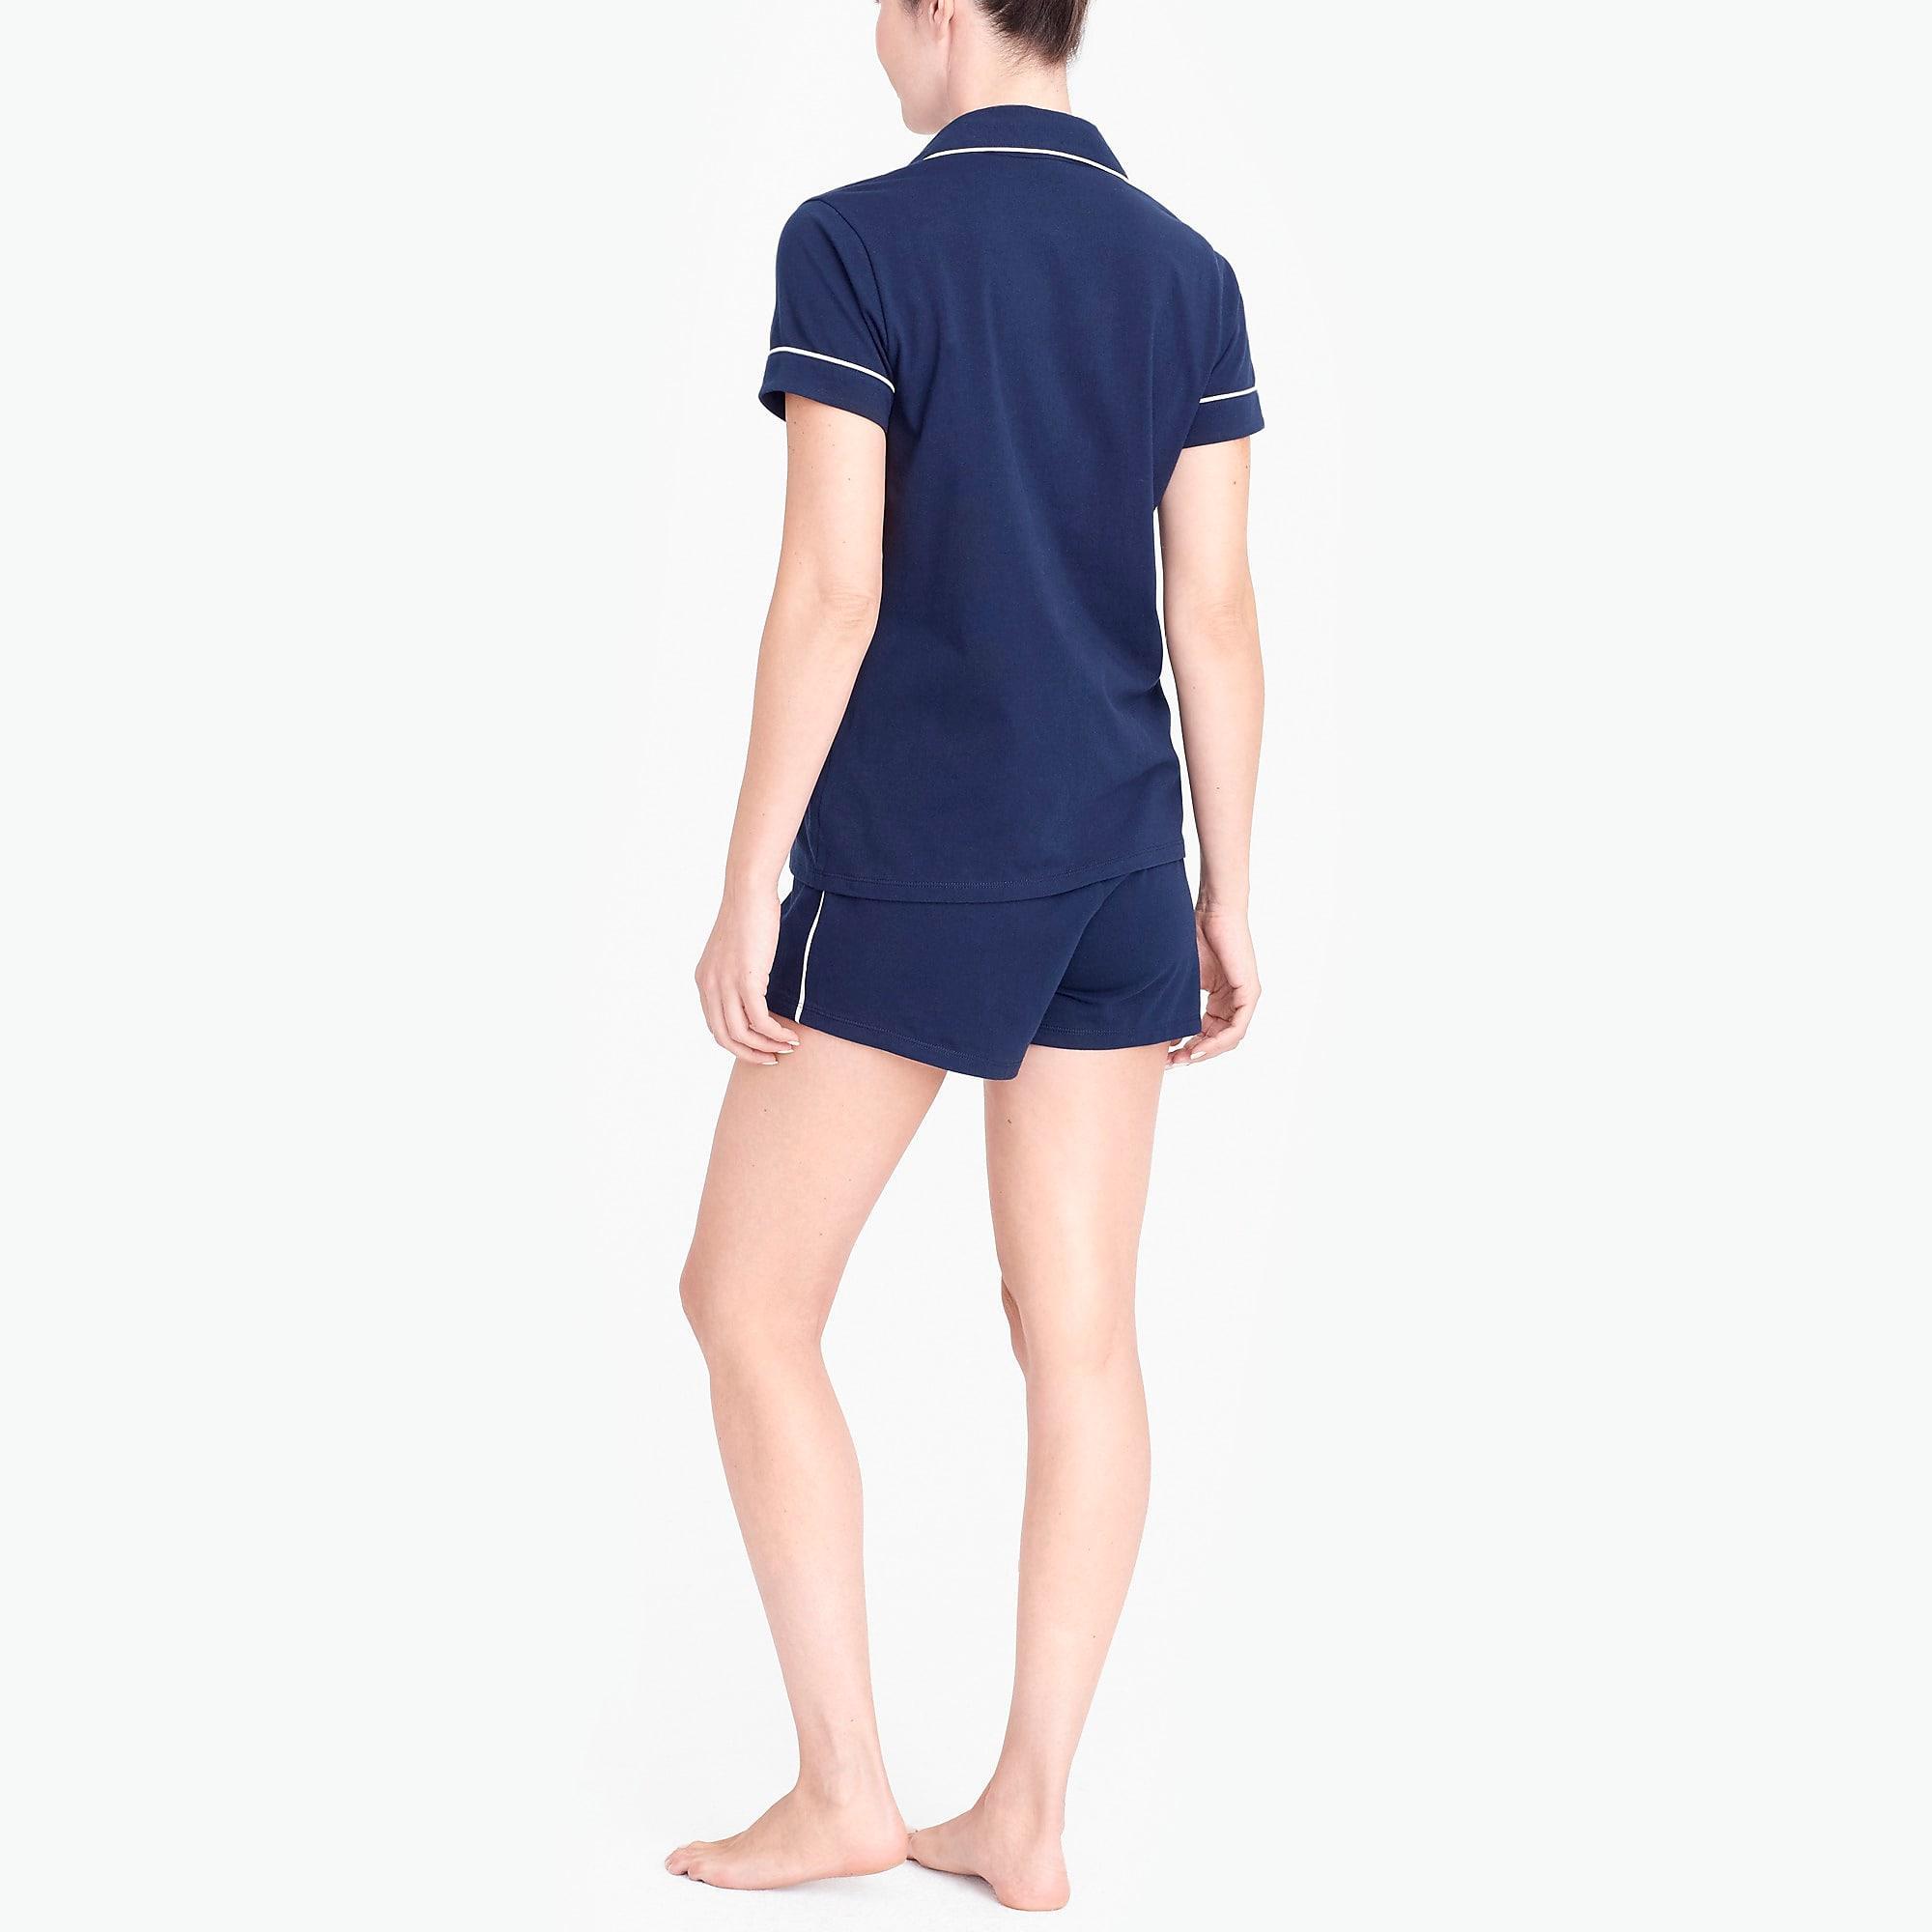 J.Crew - Blue Knit Pajama Short Set - Lyst. View fullscreen a1031e9ee